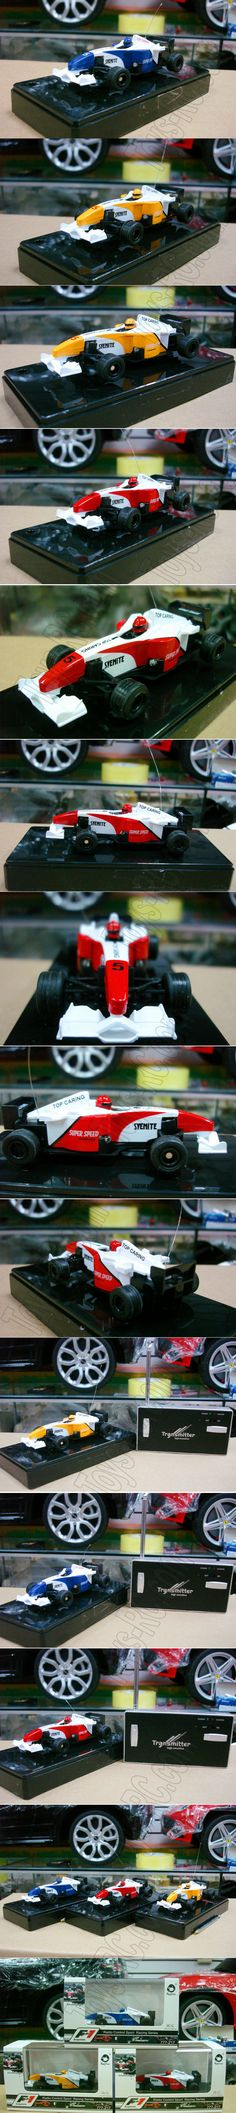 HappyCow 777-217 2CH Radio Control RC F1 Sport Racing Car  http://www.toys-rc.com/happycow-777217-2ch-radio-control-rc-f1-sport-racing-car-p-262.html